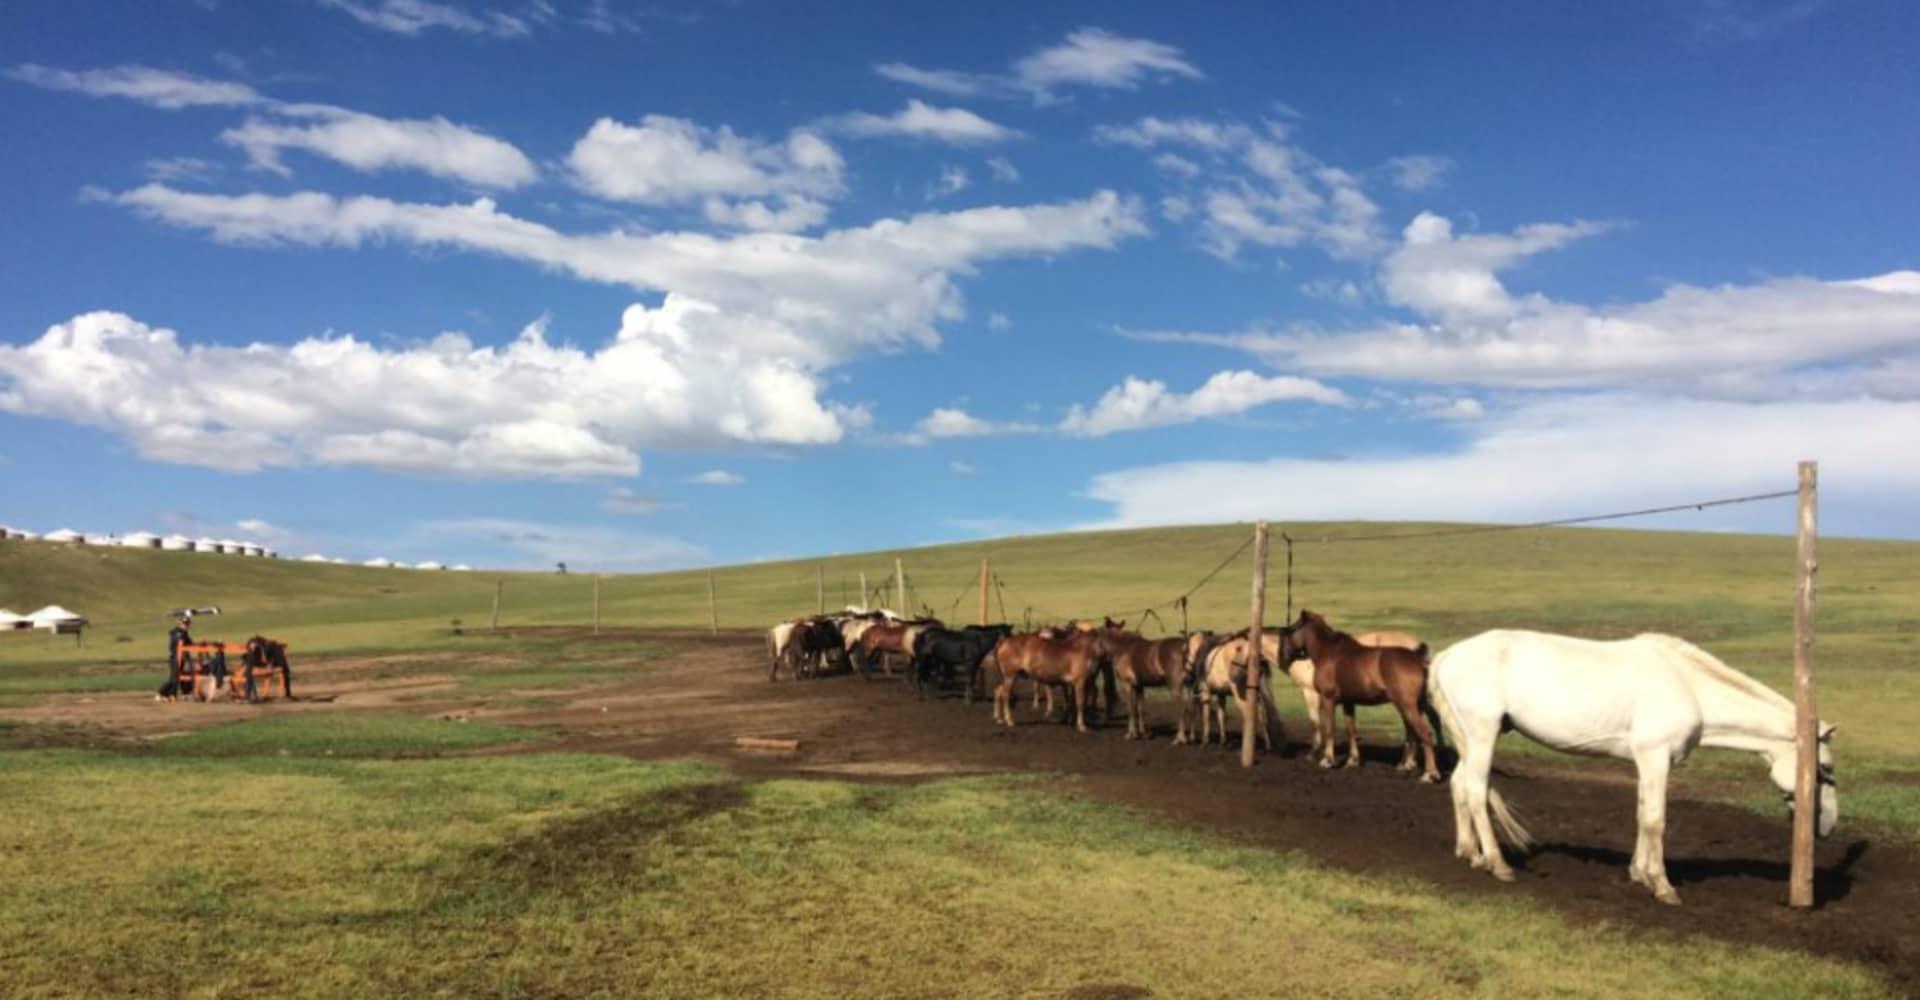 LOCATION - The Pavilions Mongolia